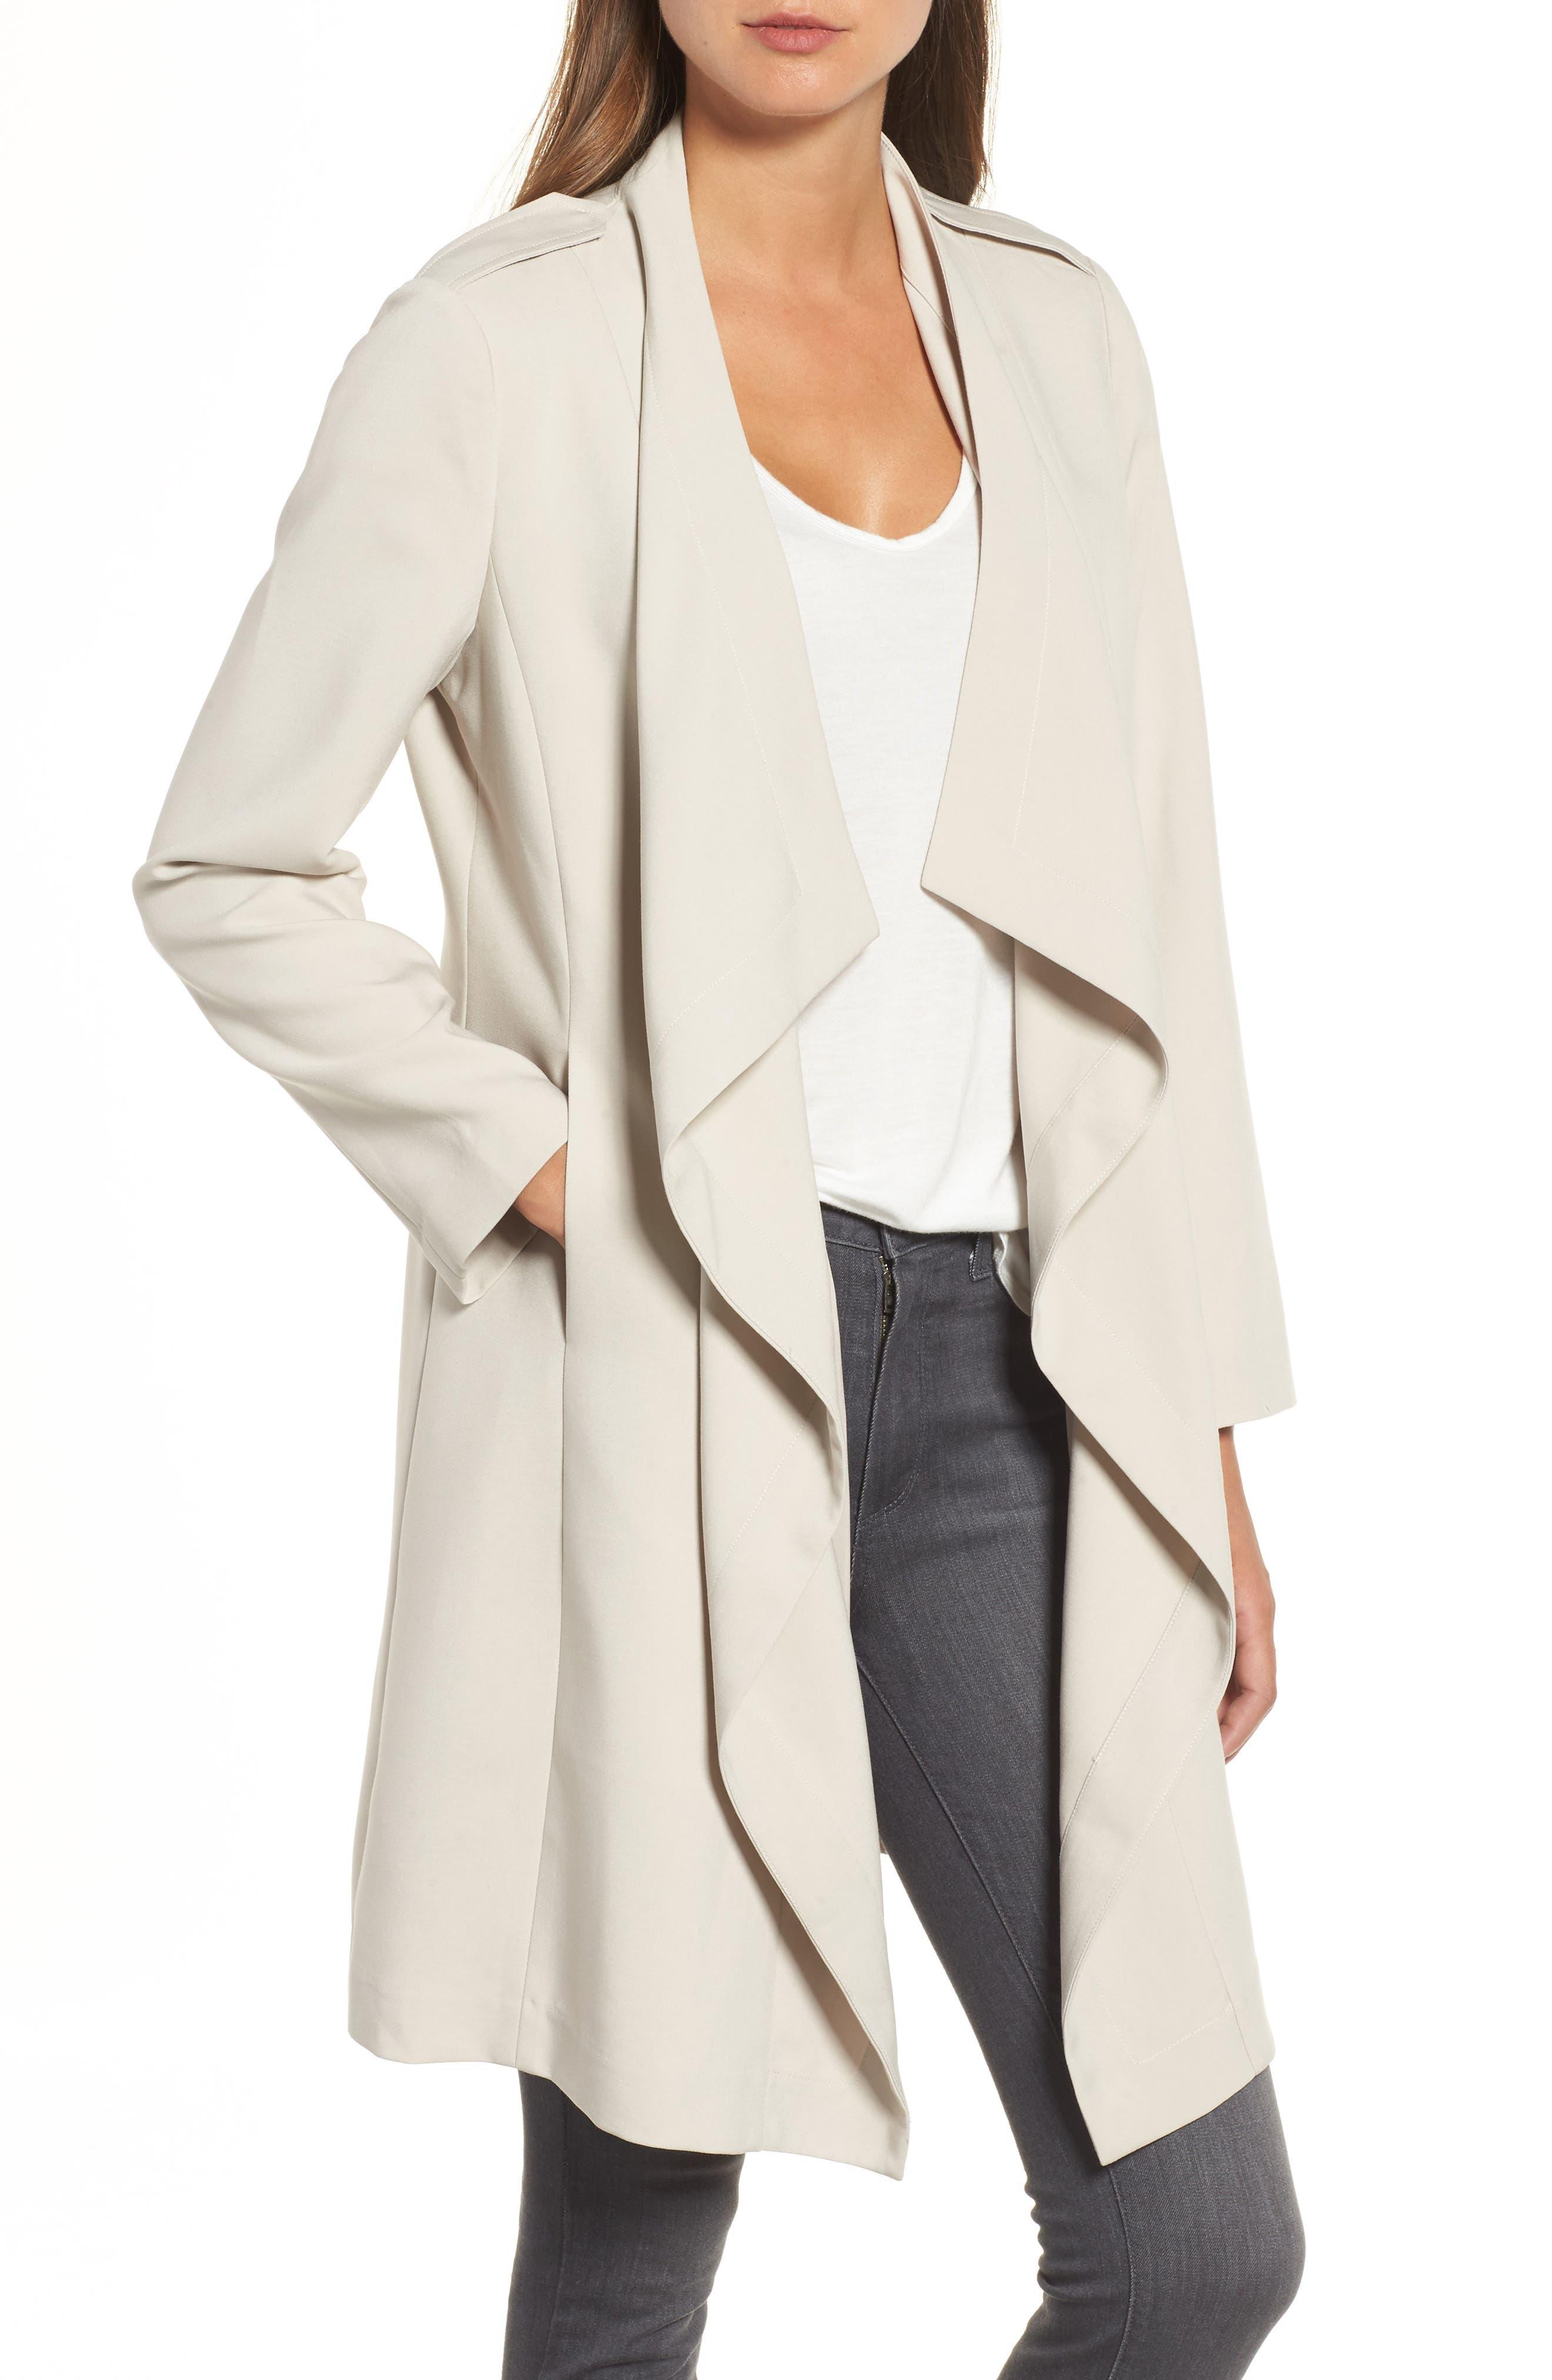 Alternate Image 1 Selected - Halogen® Drape Jacket